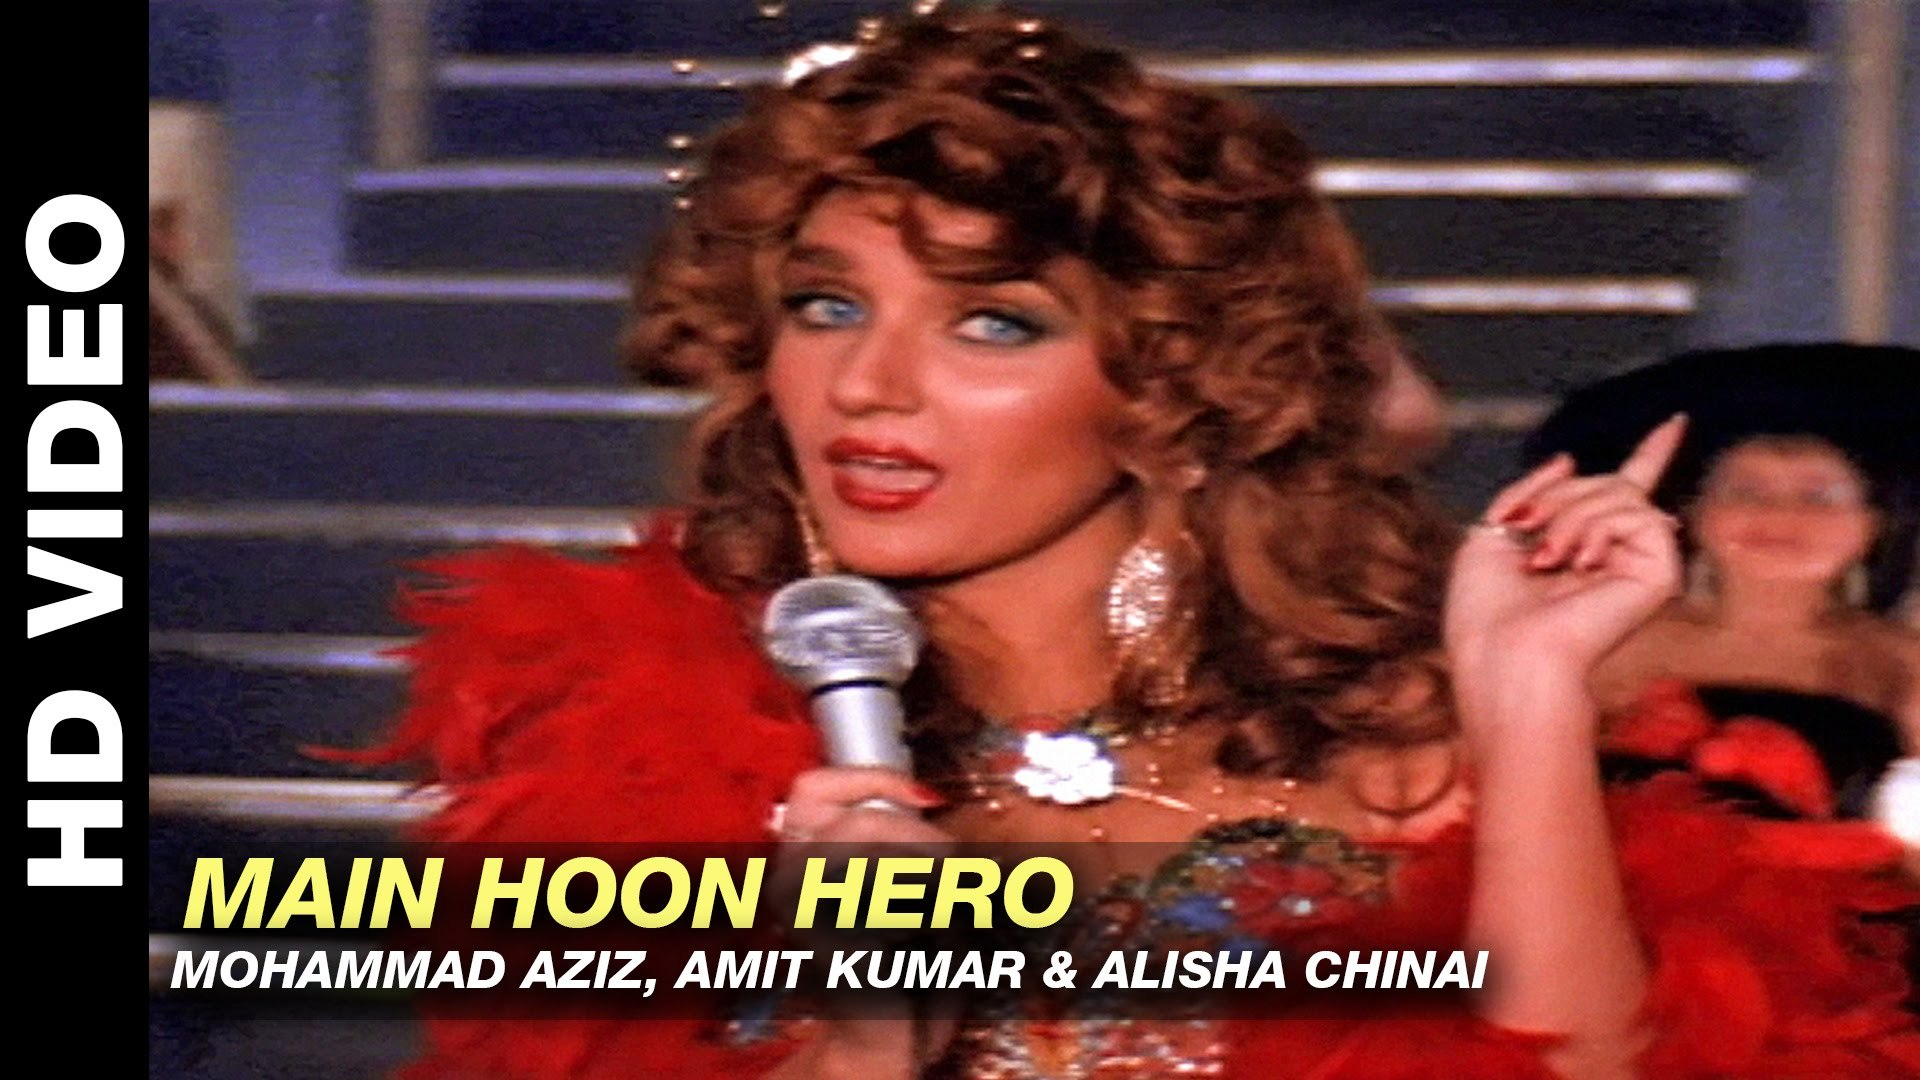 Main Hoon Hero - Ram Lakhan   Mohammad Aziz, Amit Kumar & Alisha Chinai   Anil Kapoor